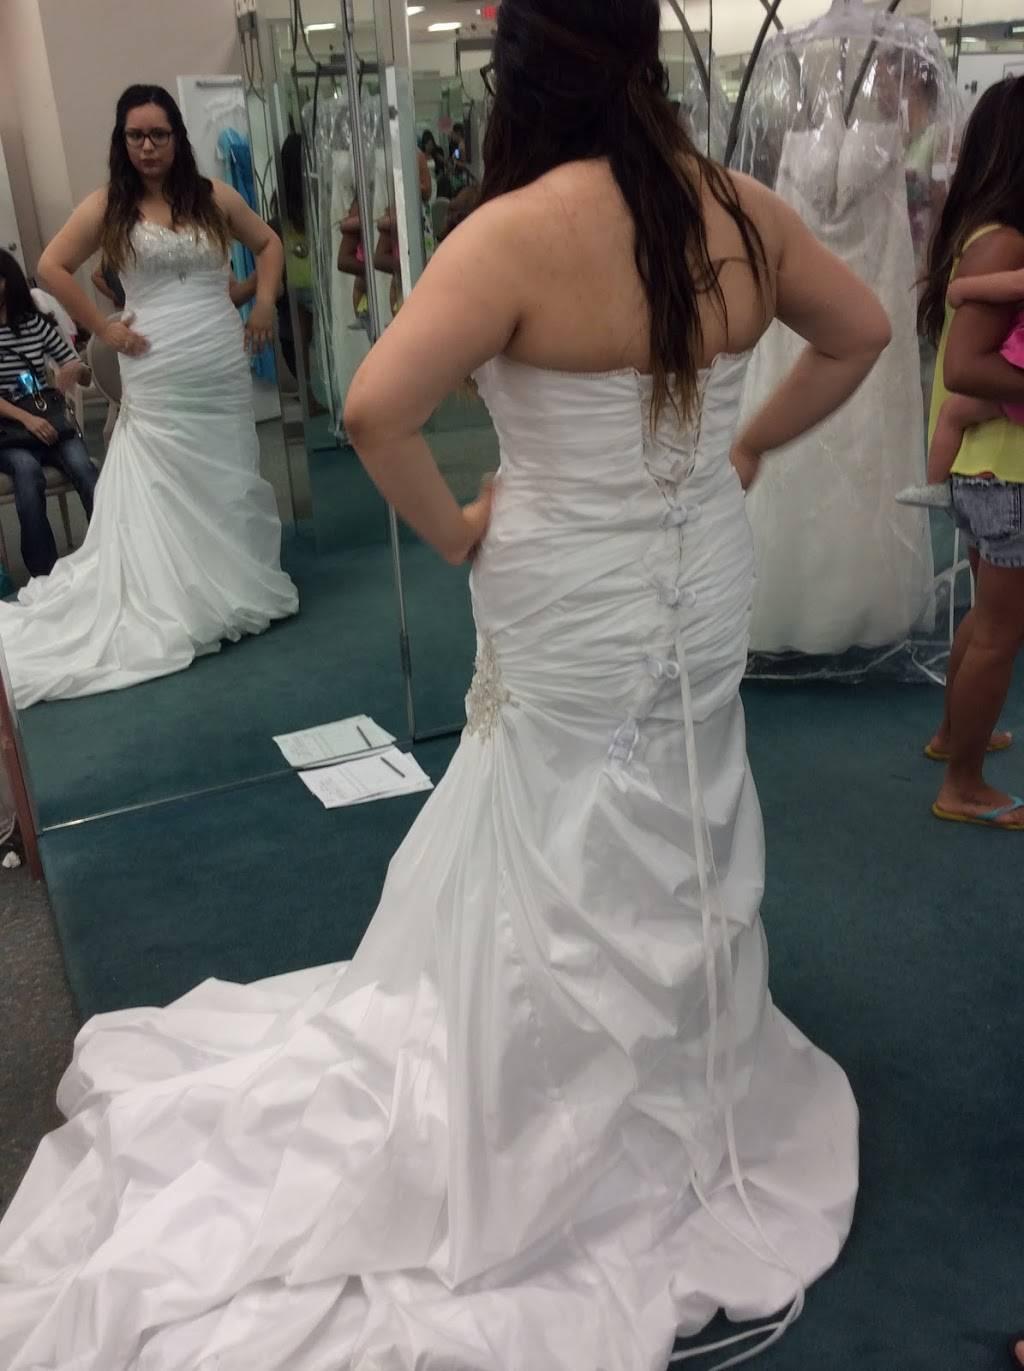 David's Bridal - shoe store  | Photo 5 of 9 | Address: 980 Camino De La Reina Suite A, San Diego, CA 92108, USA | Phone: (619) 220-8008